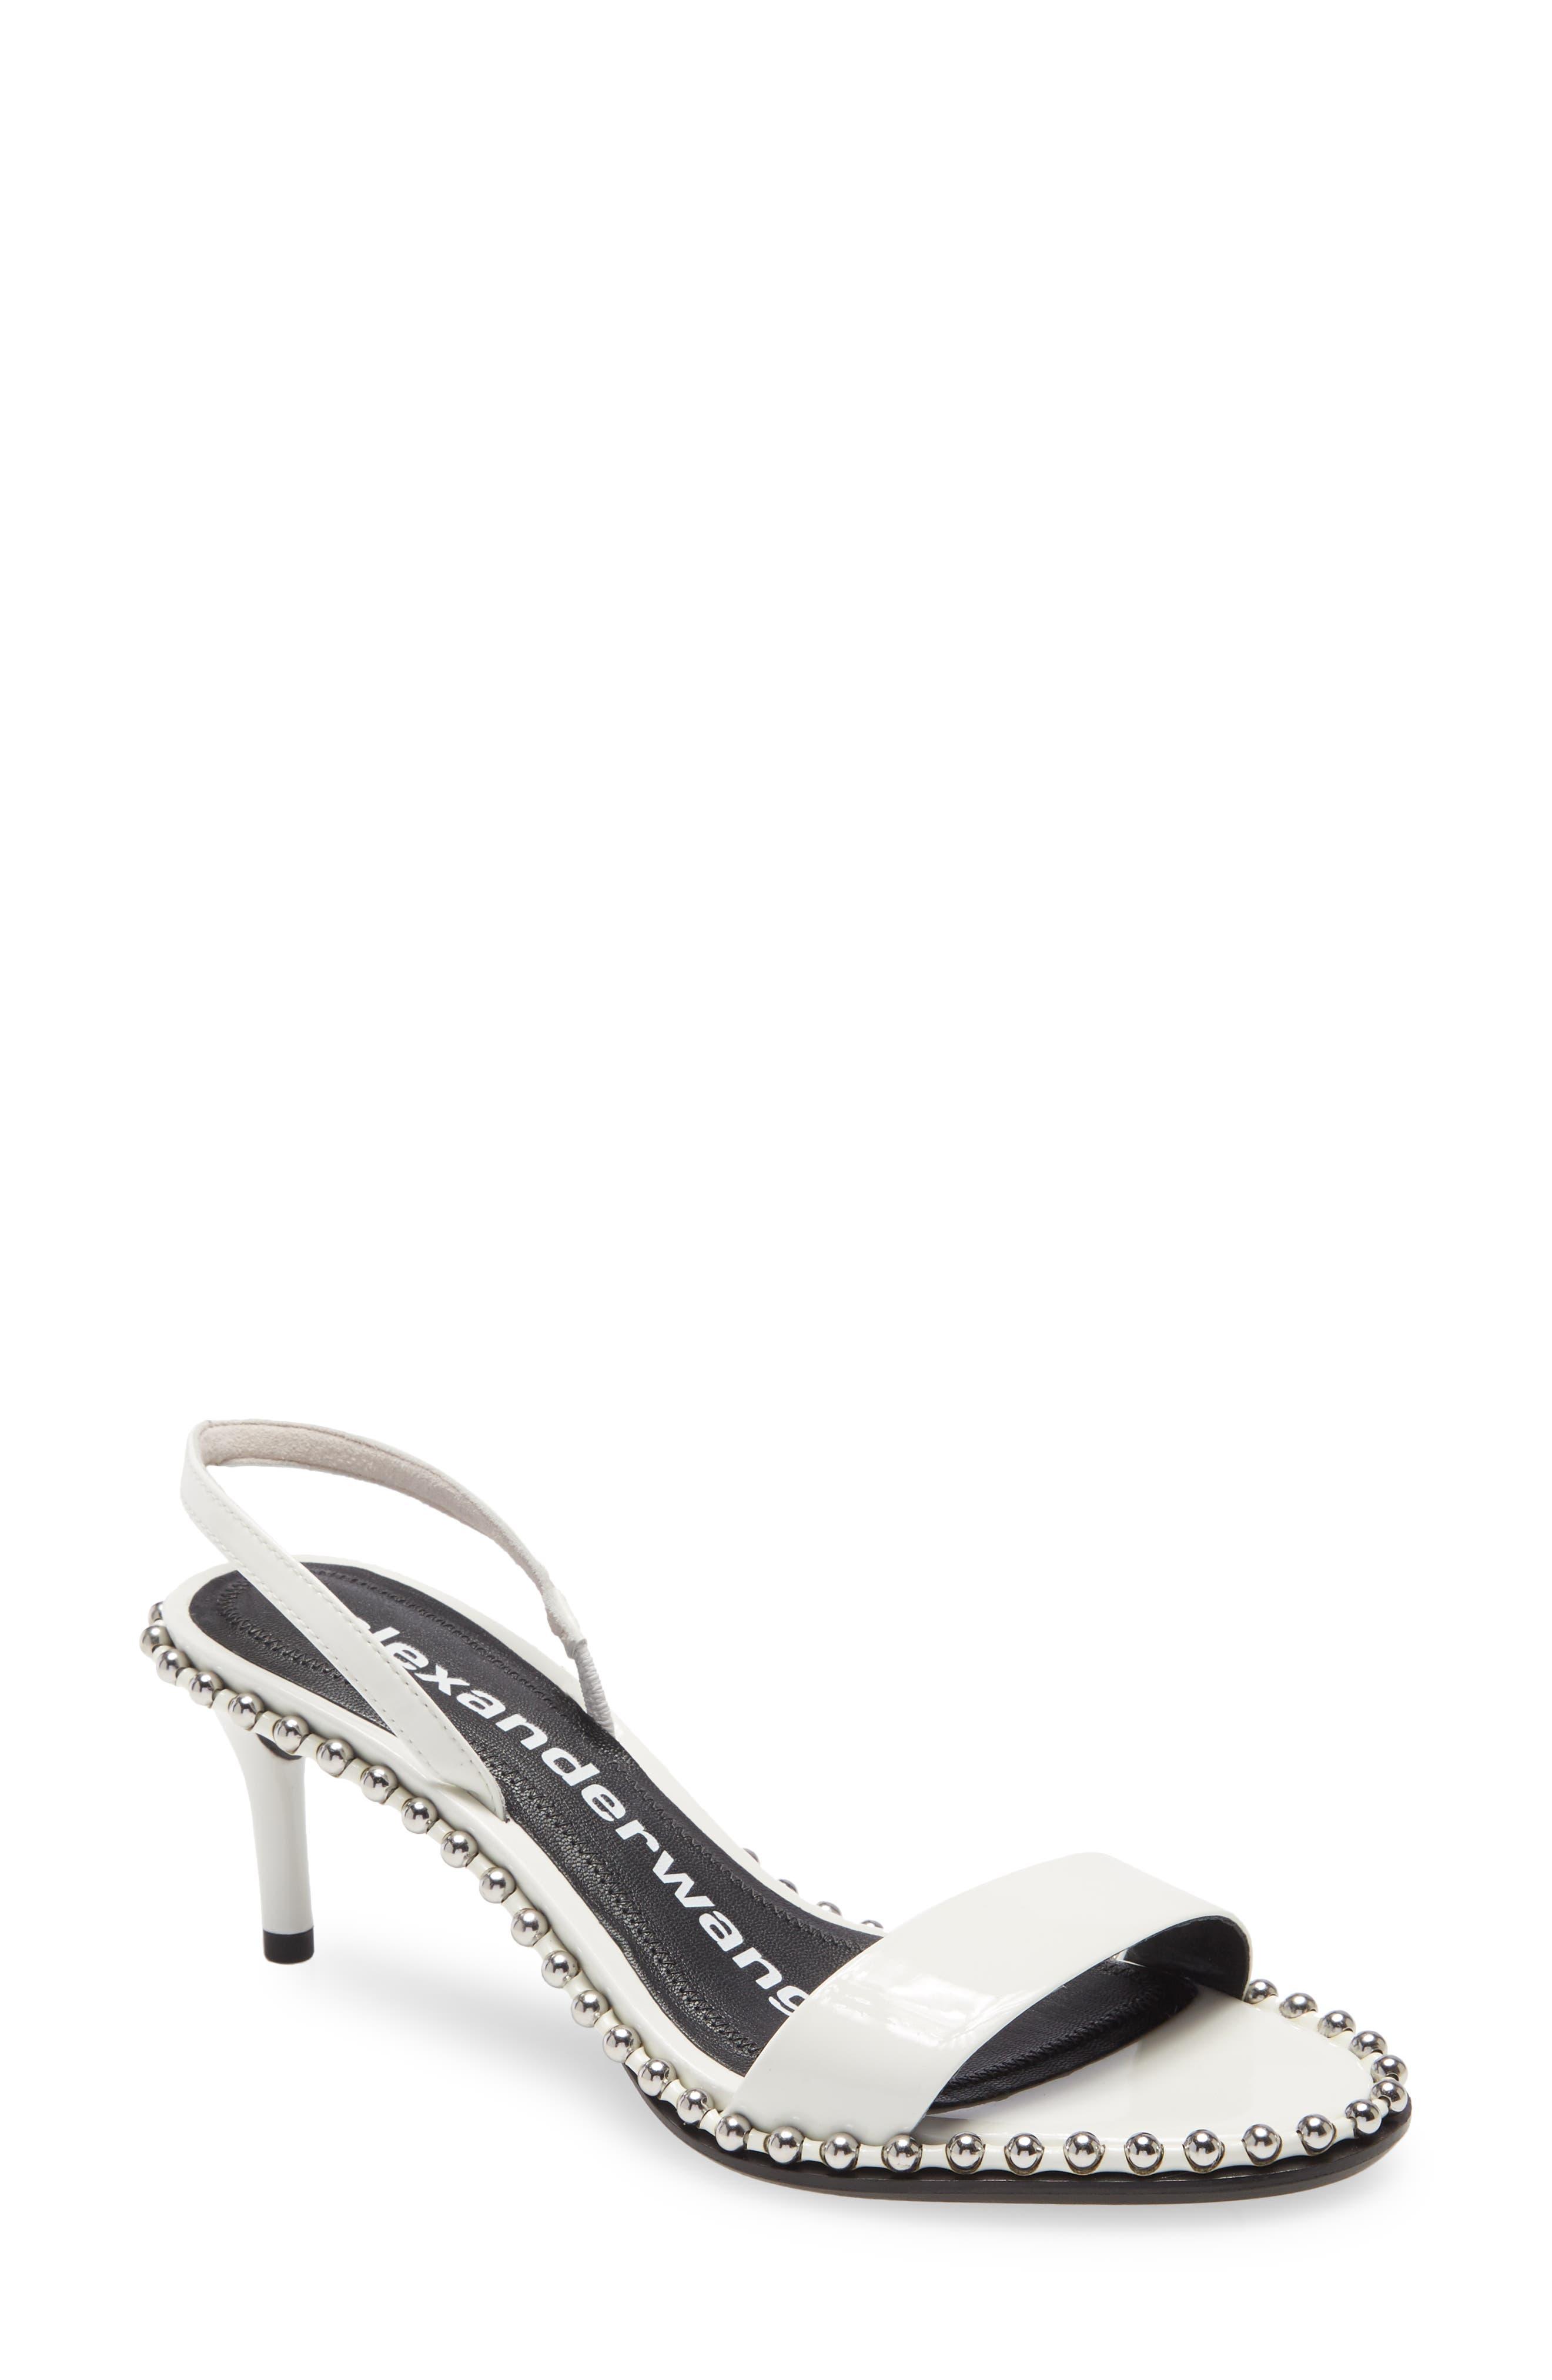 Women's Alexander Wang Shoes   Nordstrom